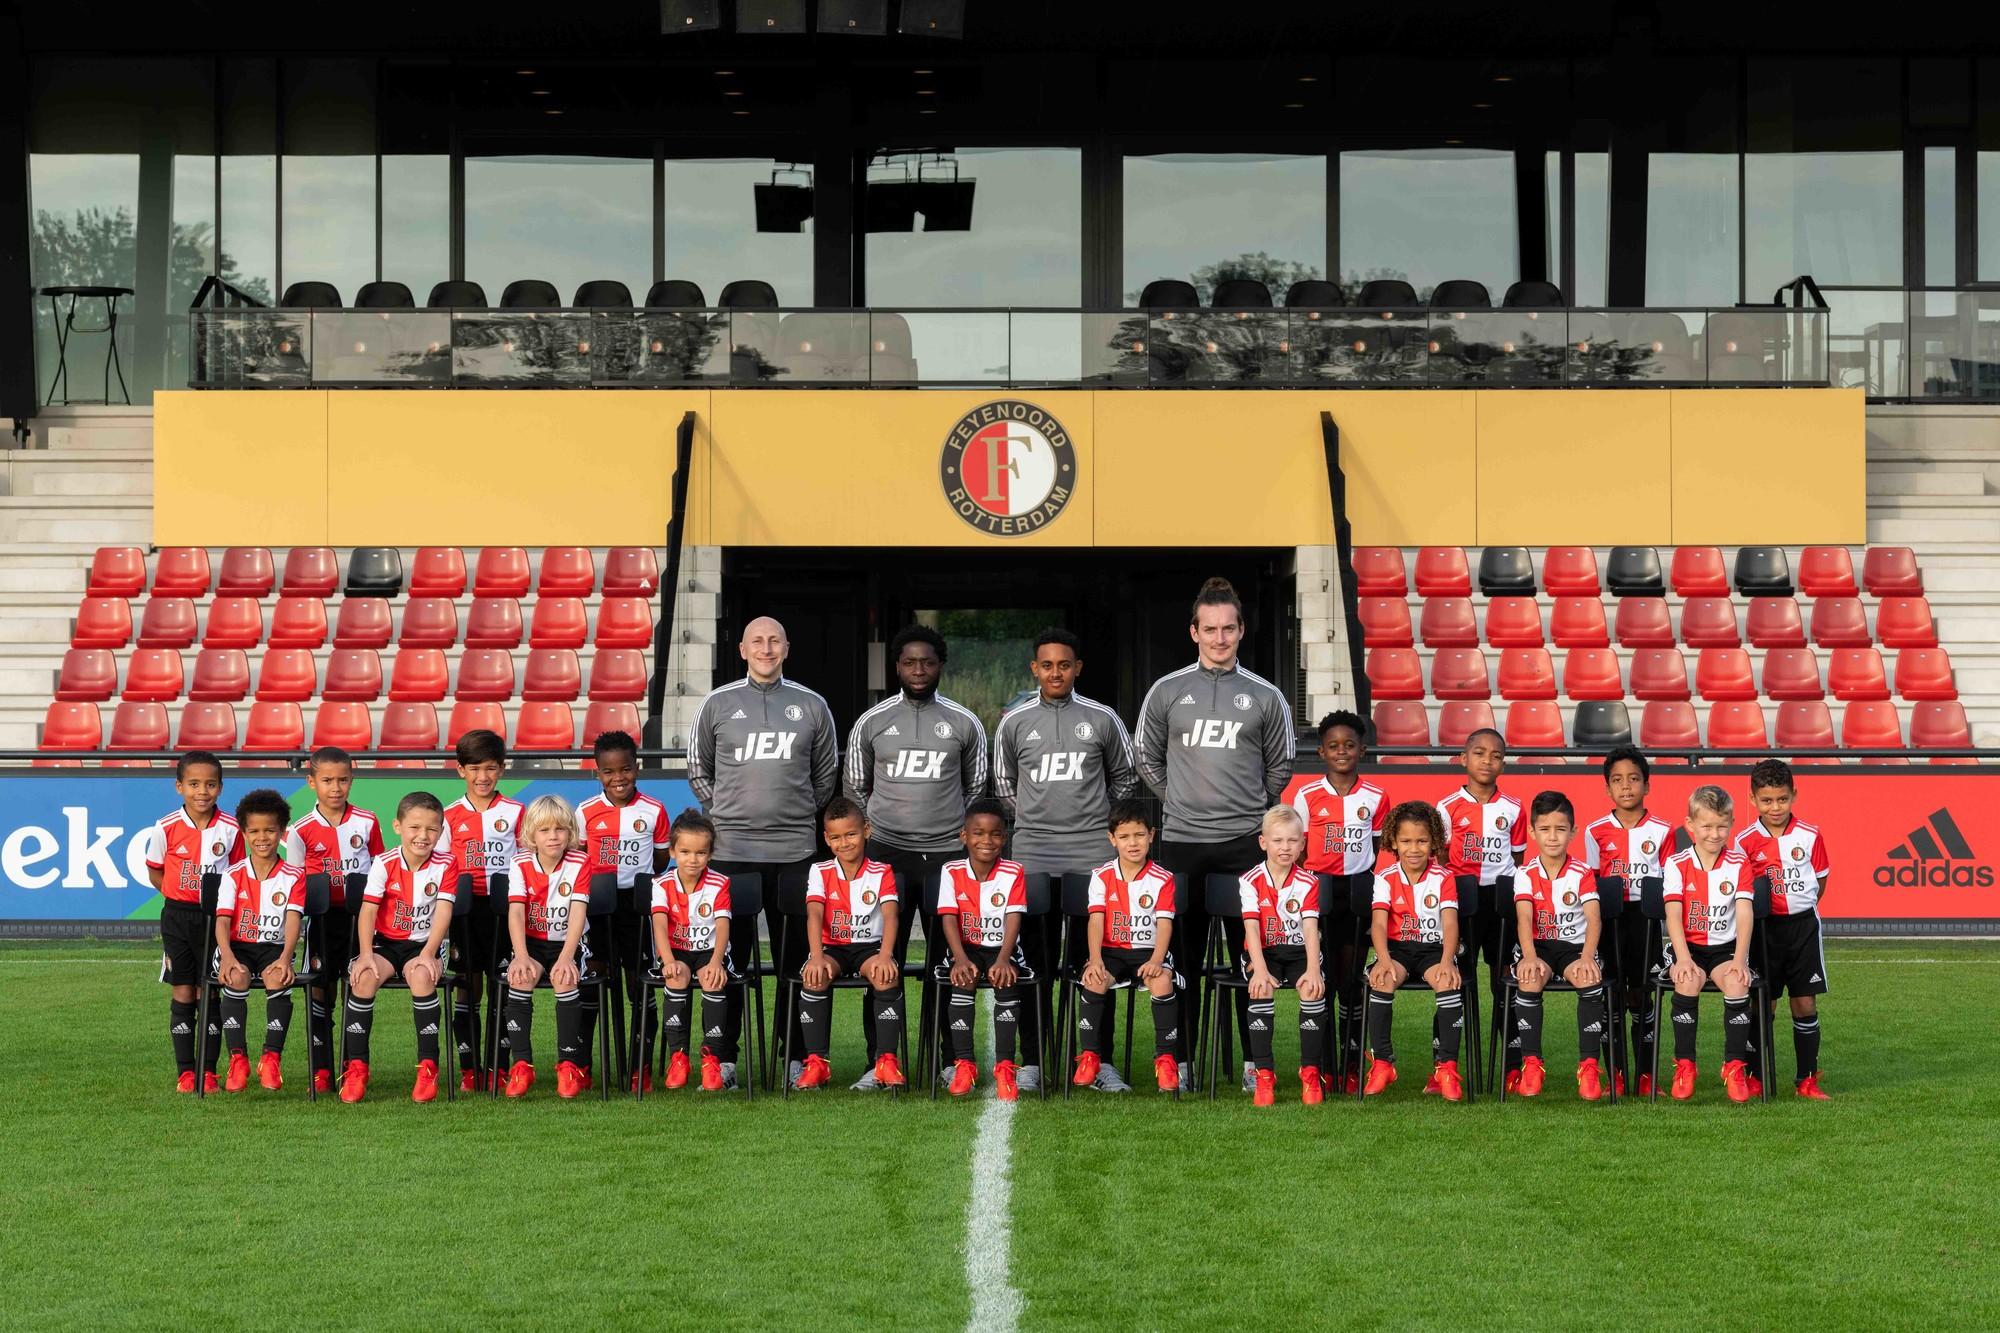 Feyenoord O7O8 20212022